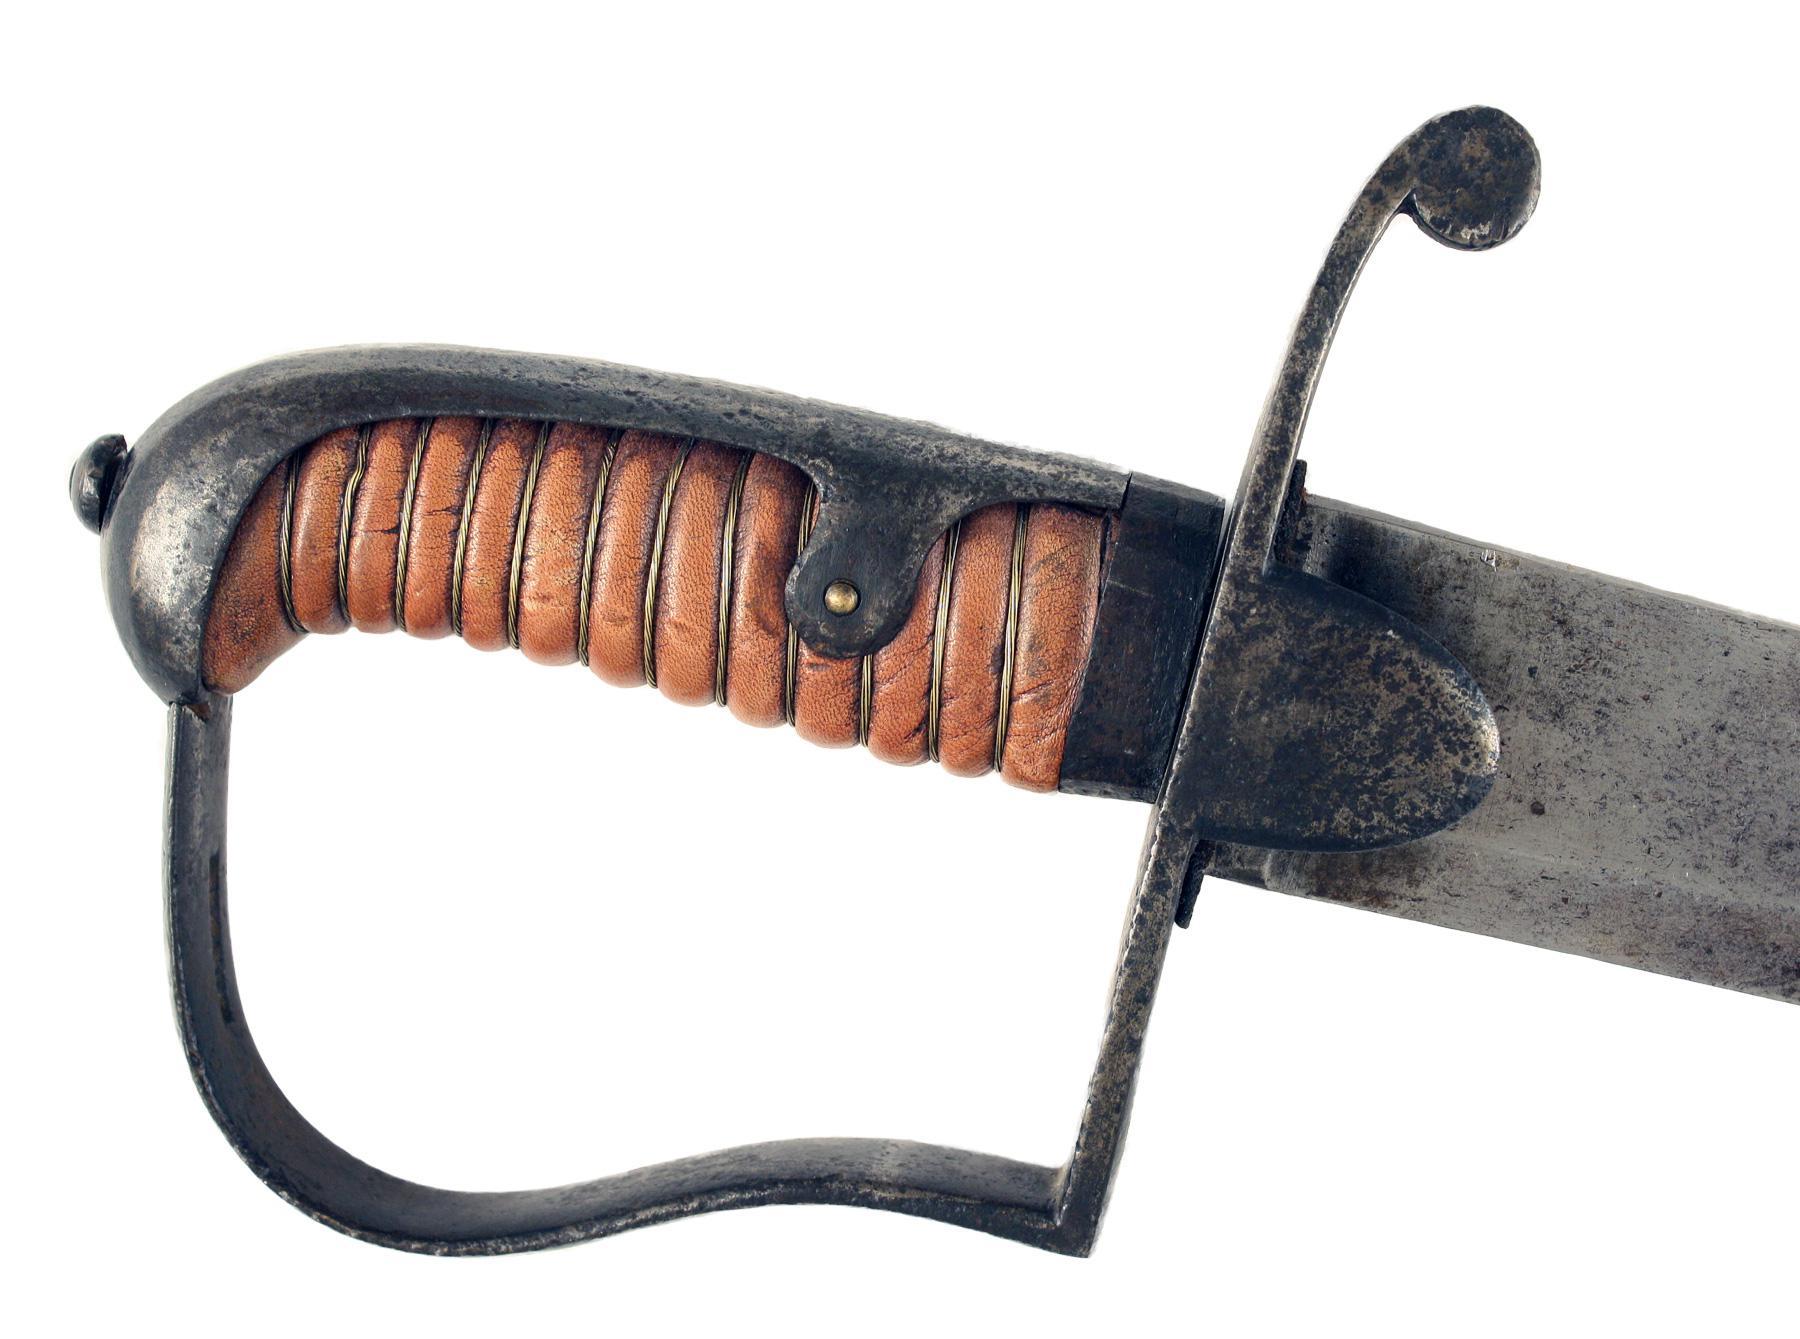 A 1796 Cavalry Sword